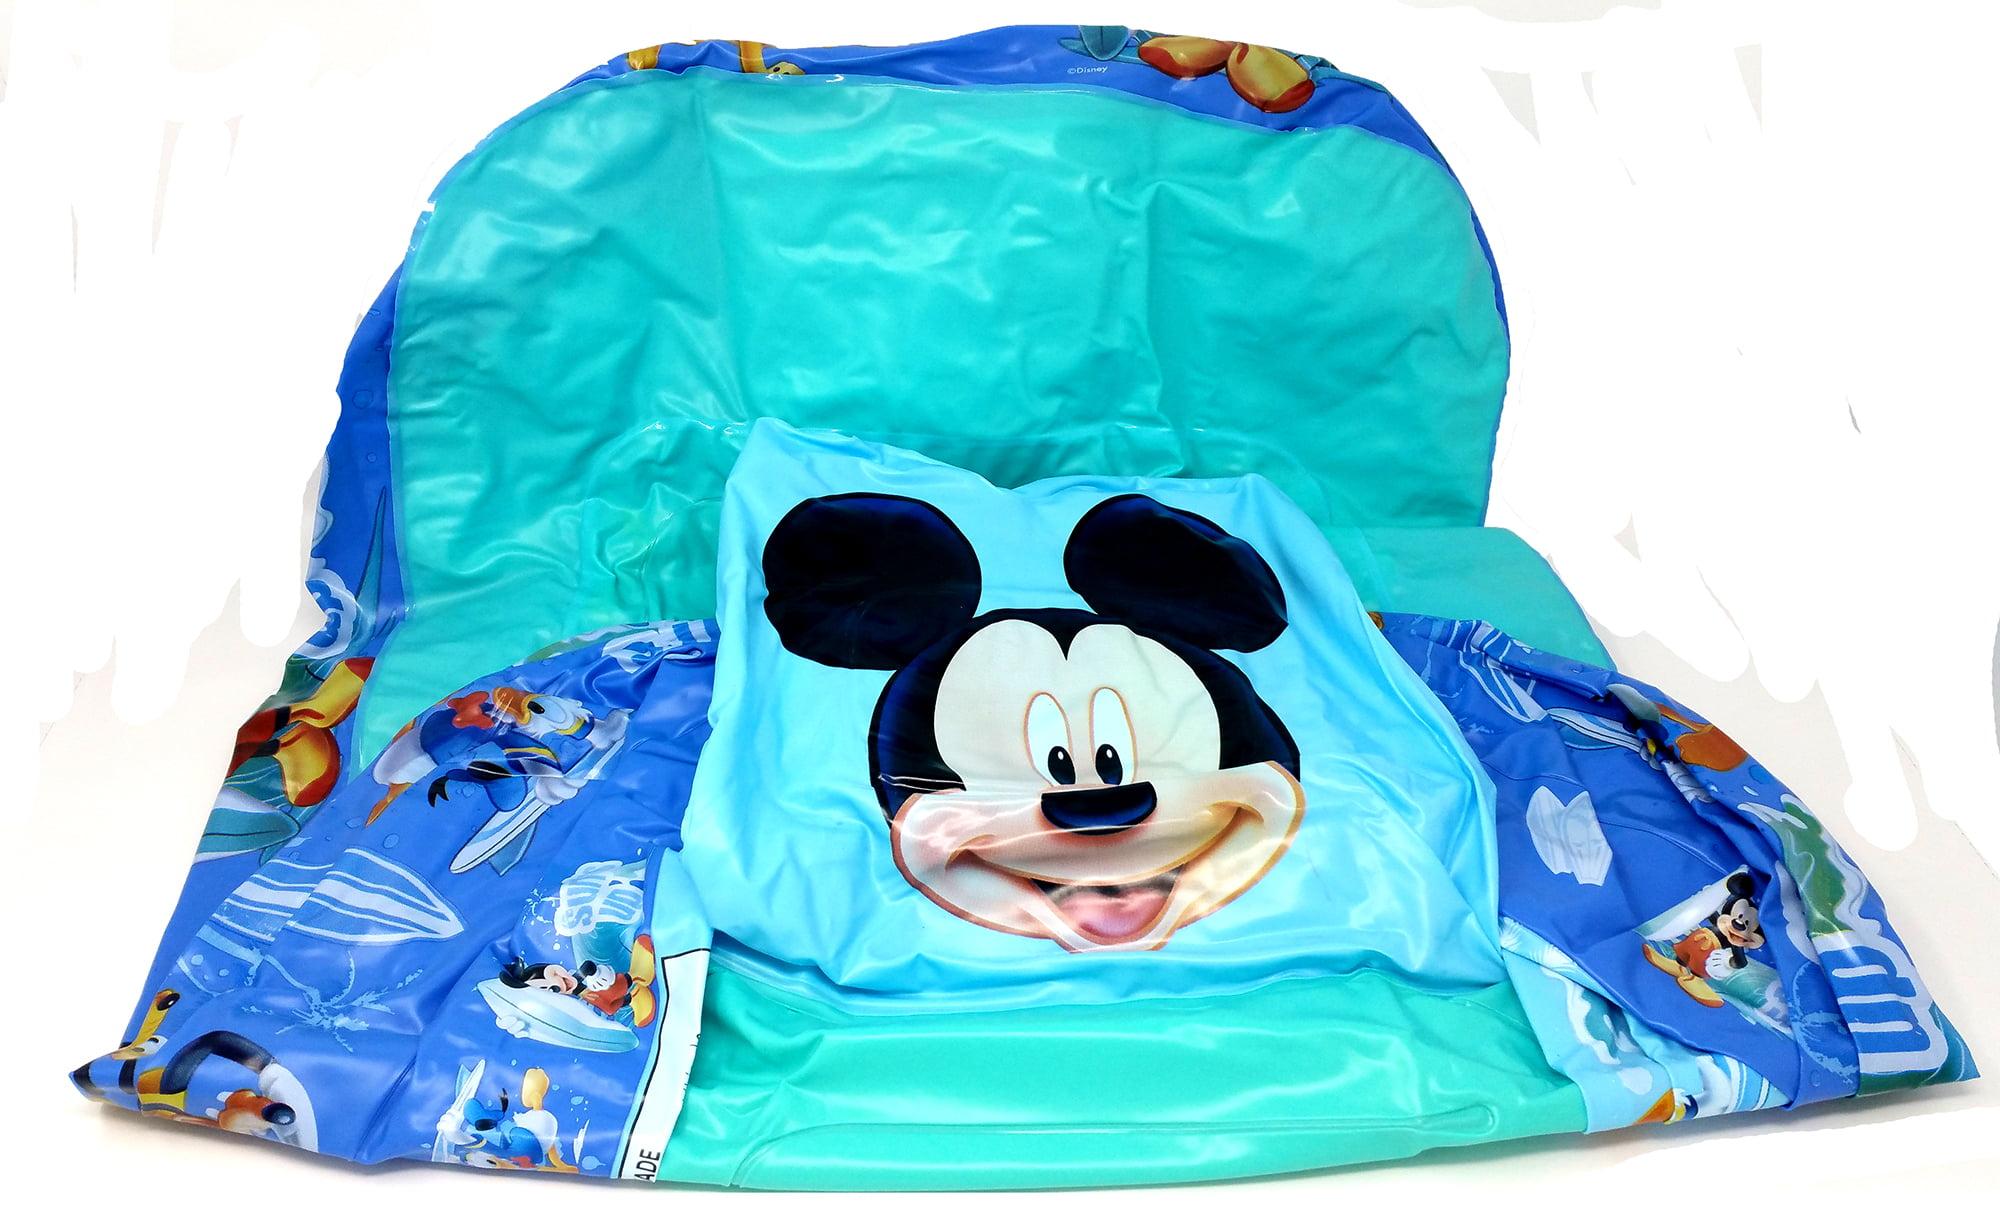 Disney Mickey Mouse, Inflatable Safety Bathtub, Blue - Walmart.com